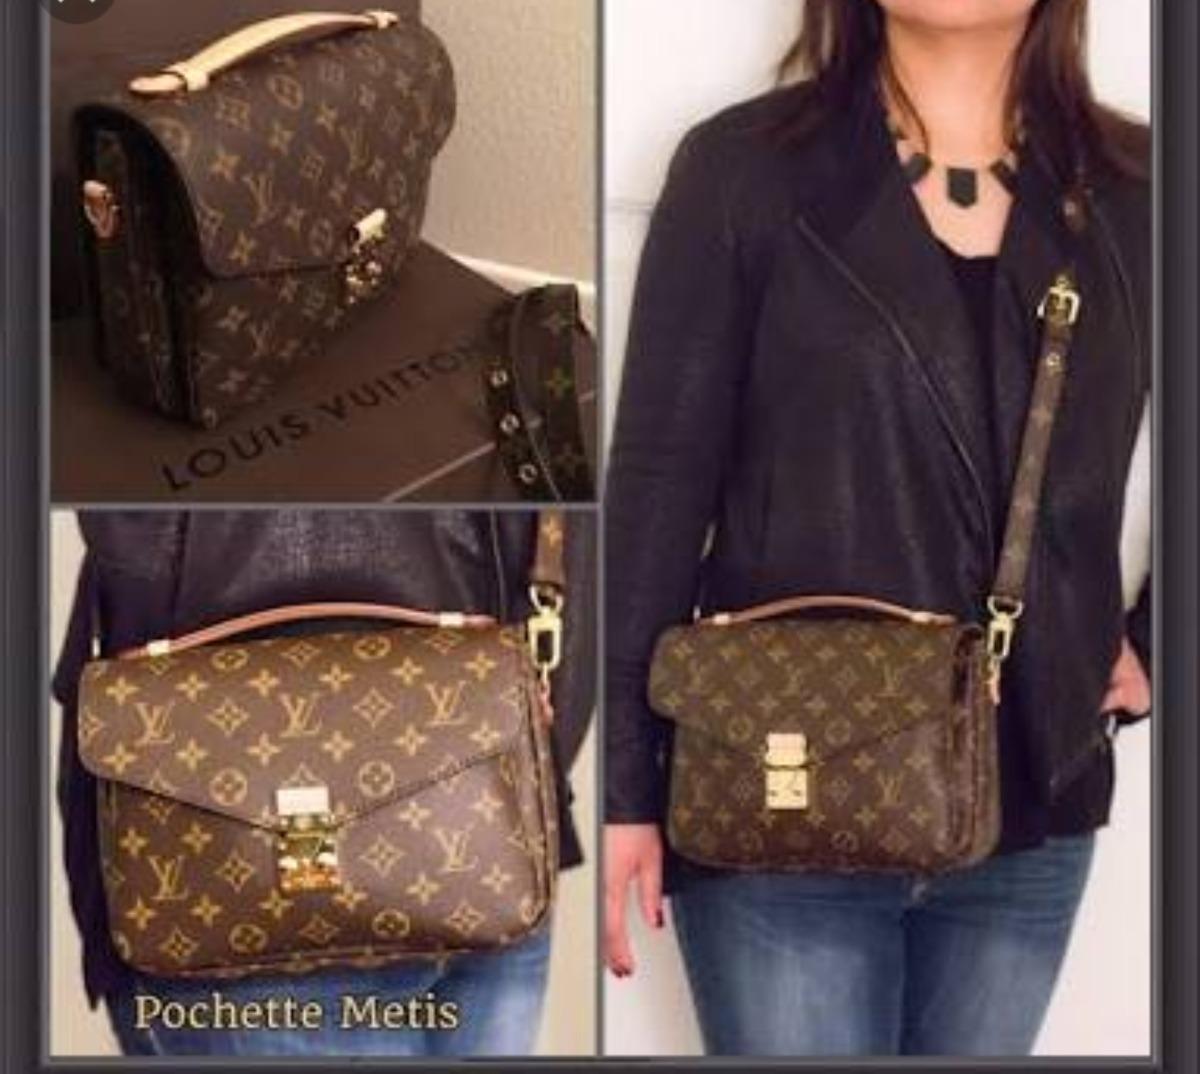 b4d3822951f Maravilhosa Bolsa Louis Vuitton Pochette Métis Canvas - R  1.050